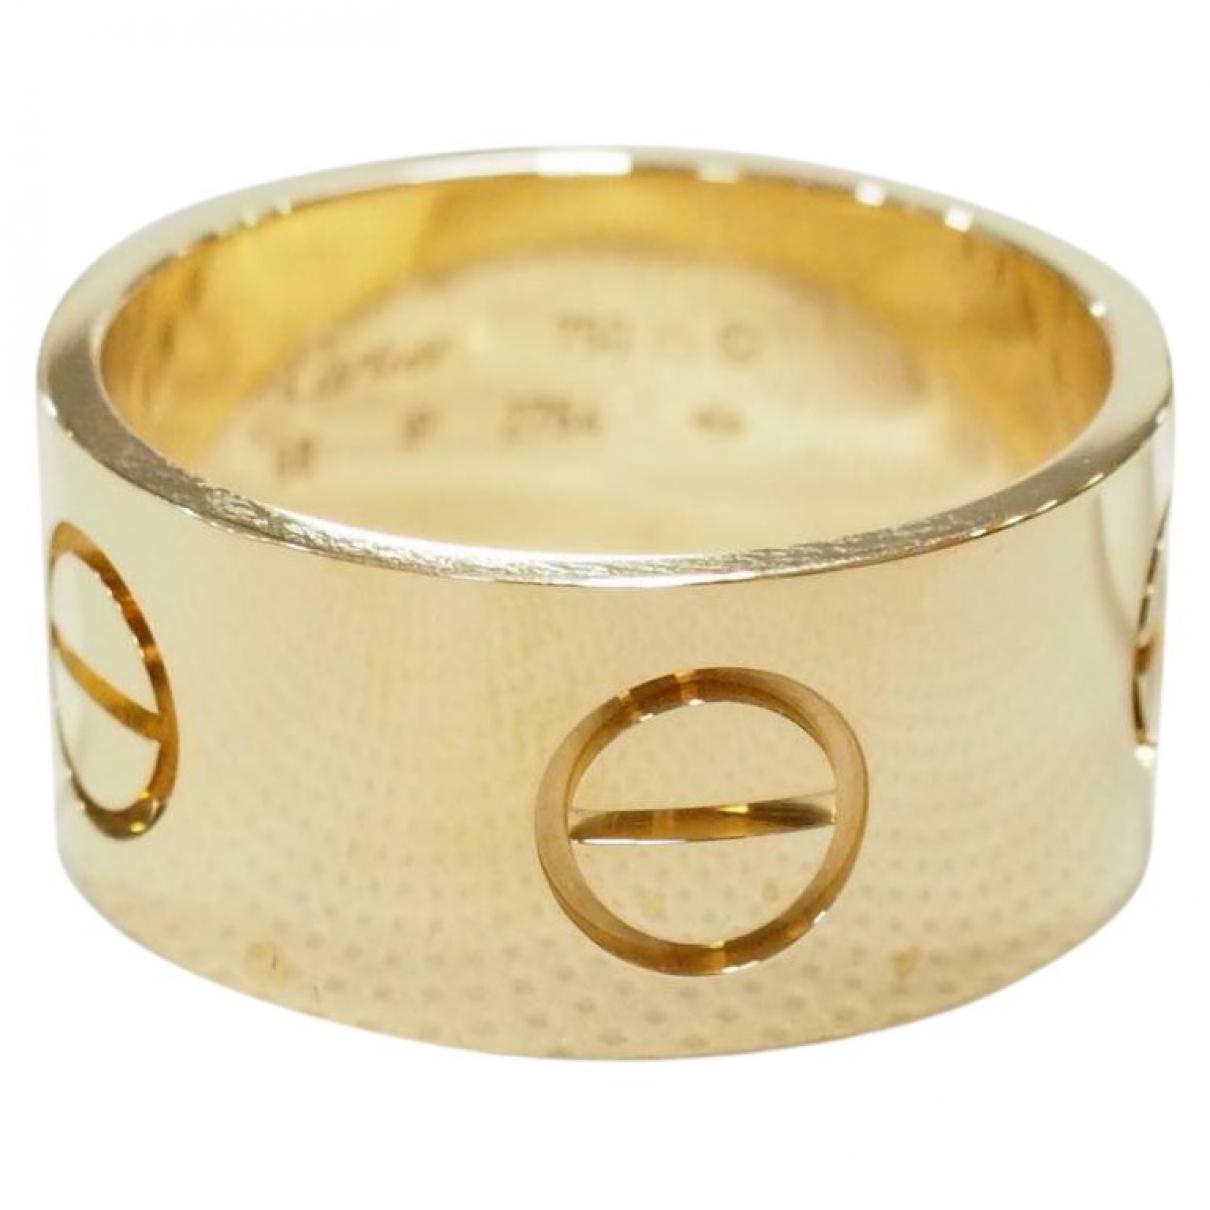 Joya Love de Oro amarillo Cartier